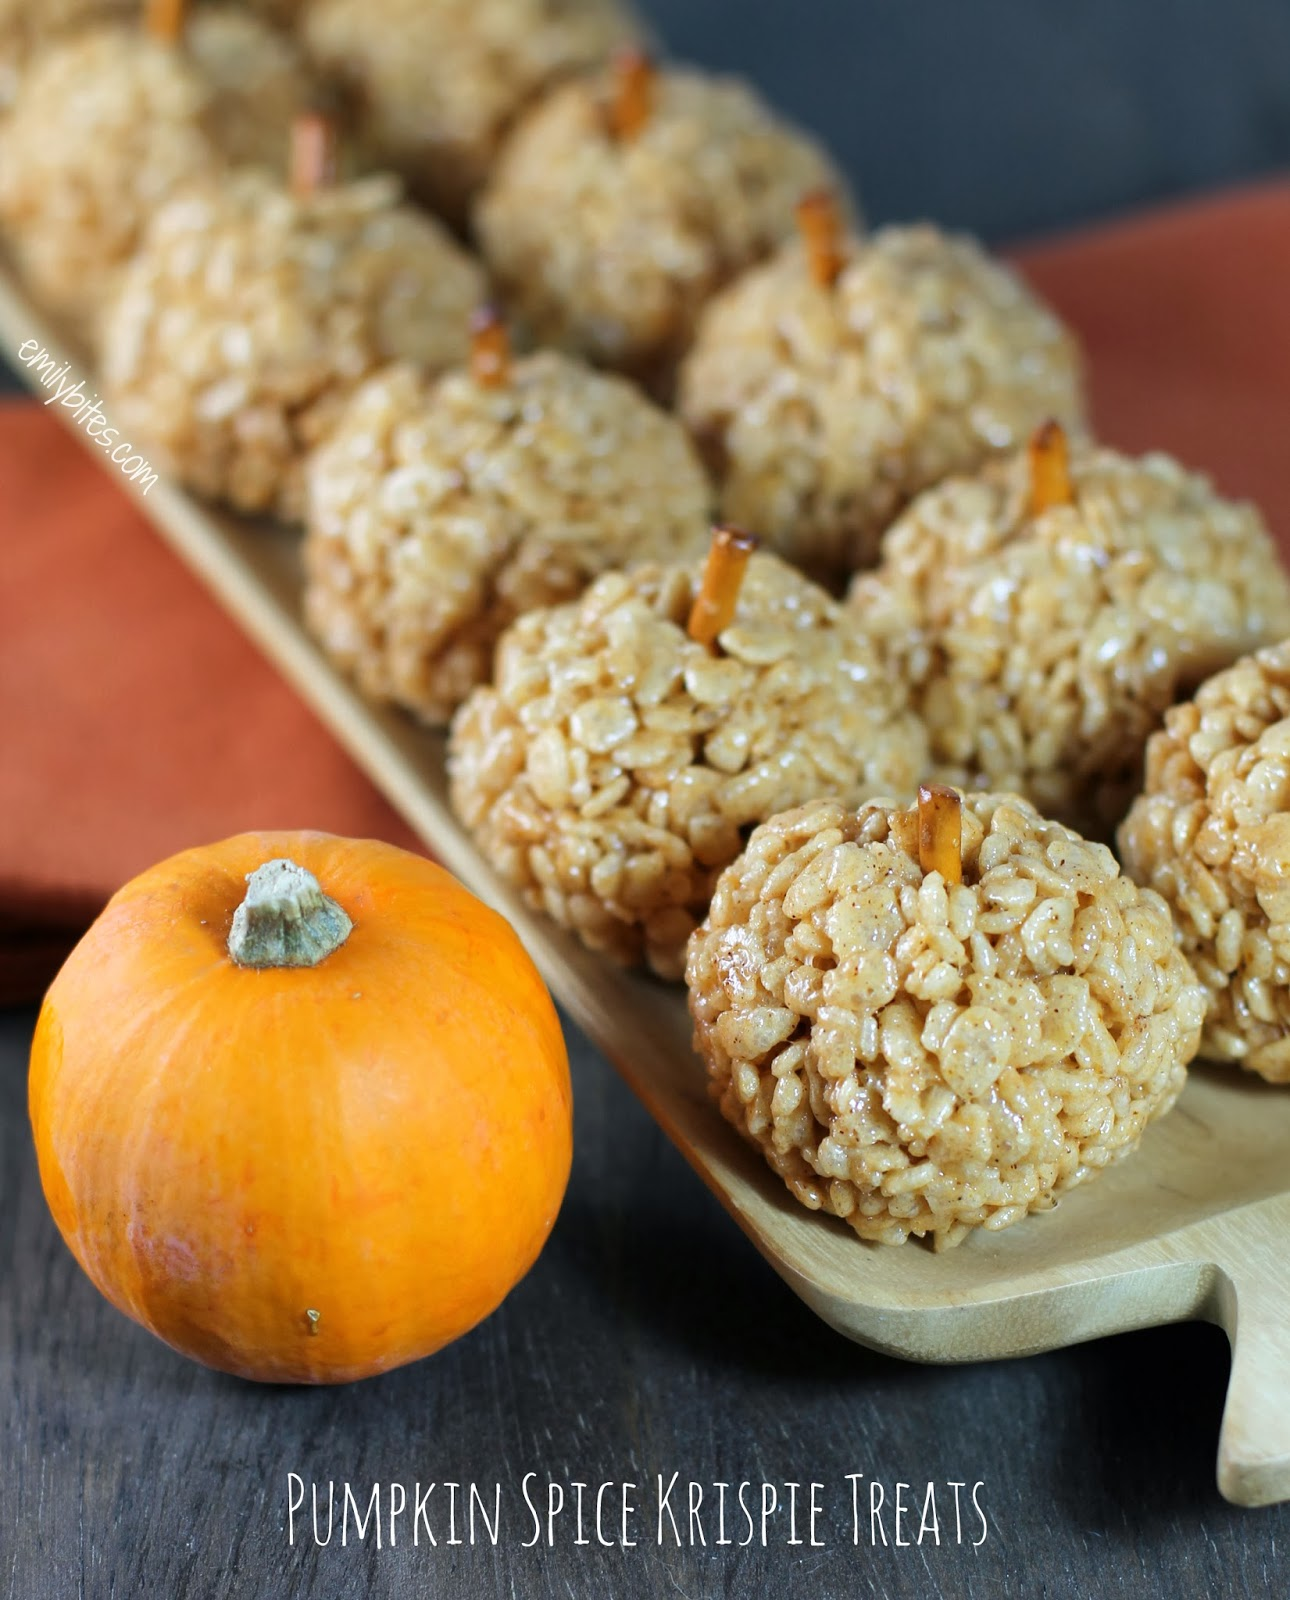 Pumpkin Spice Krispie Treats | Pinnutty.com